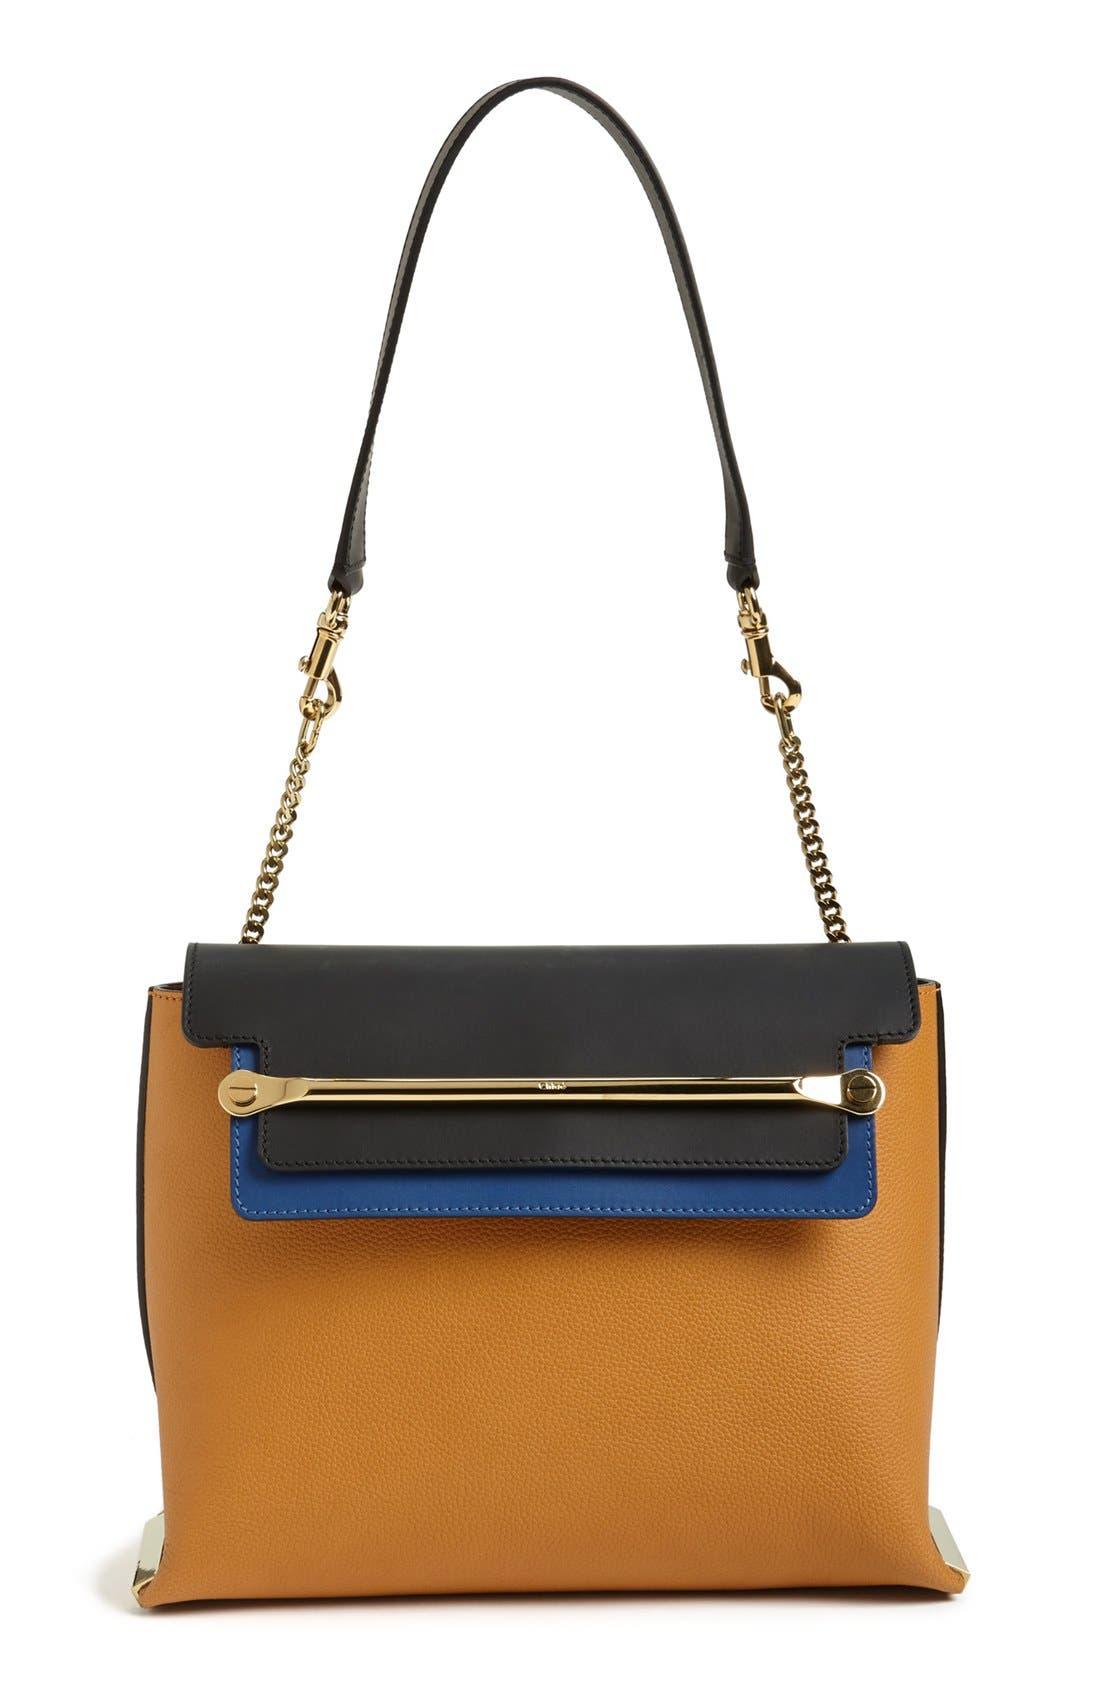 Alternate Image 1 Selected - Chloé 'Clare' Tricolor Leather Shoulder Bag